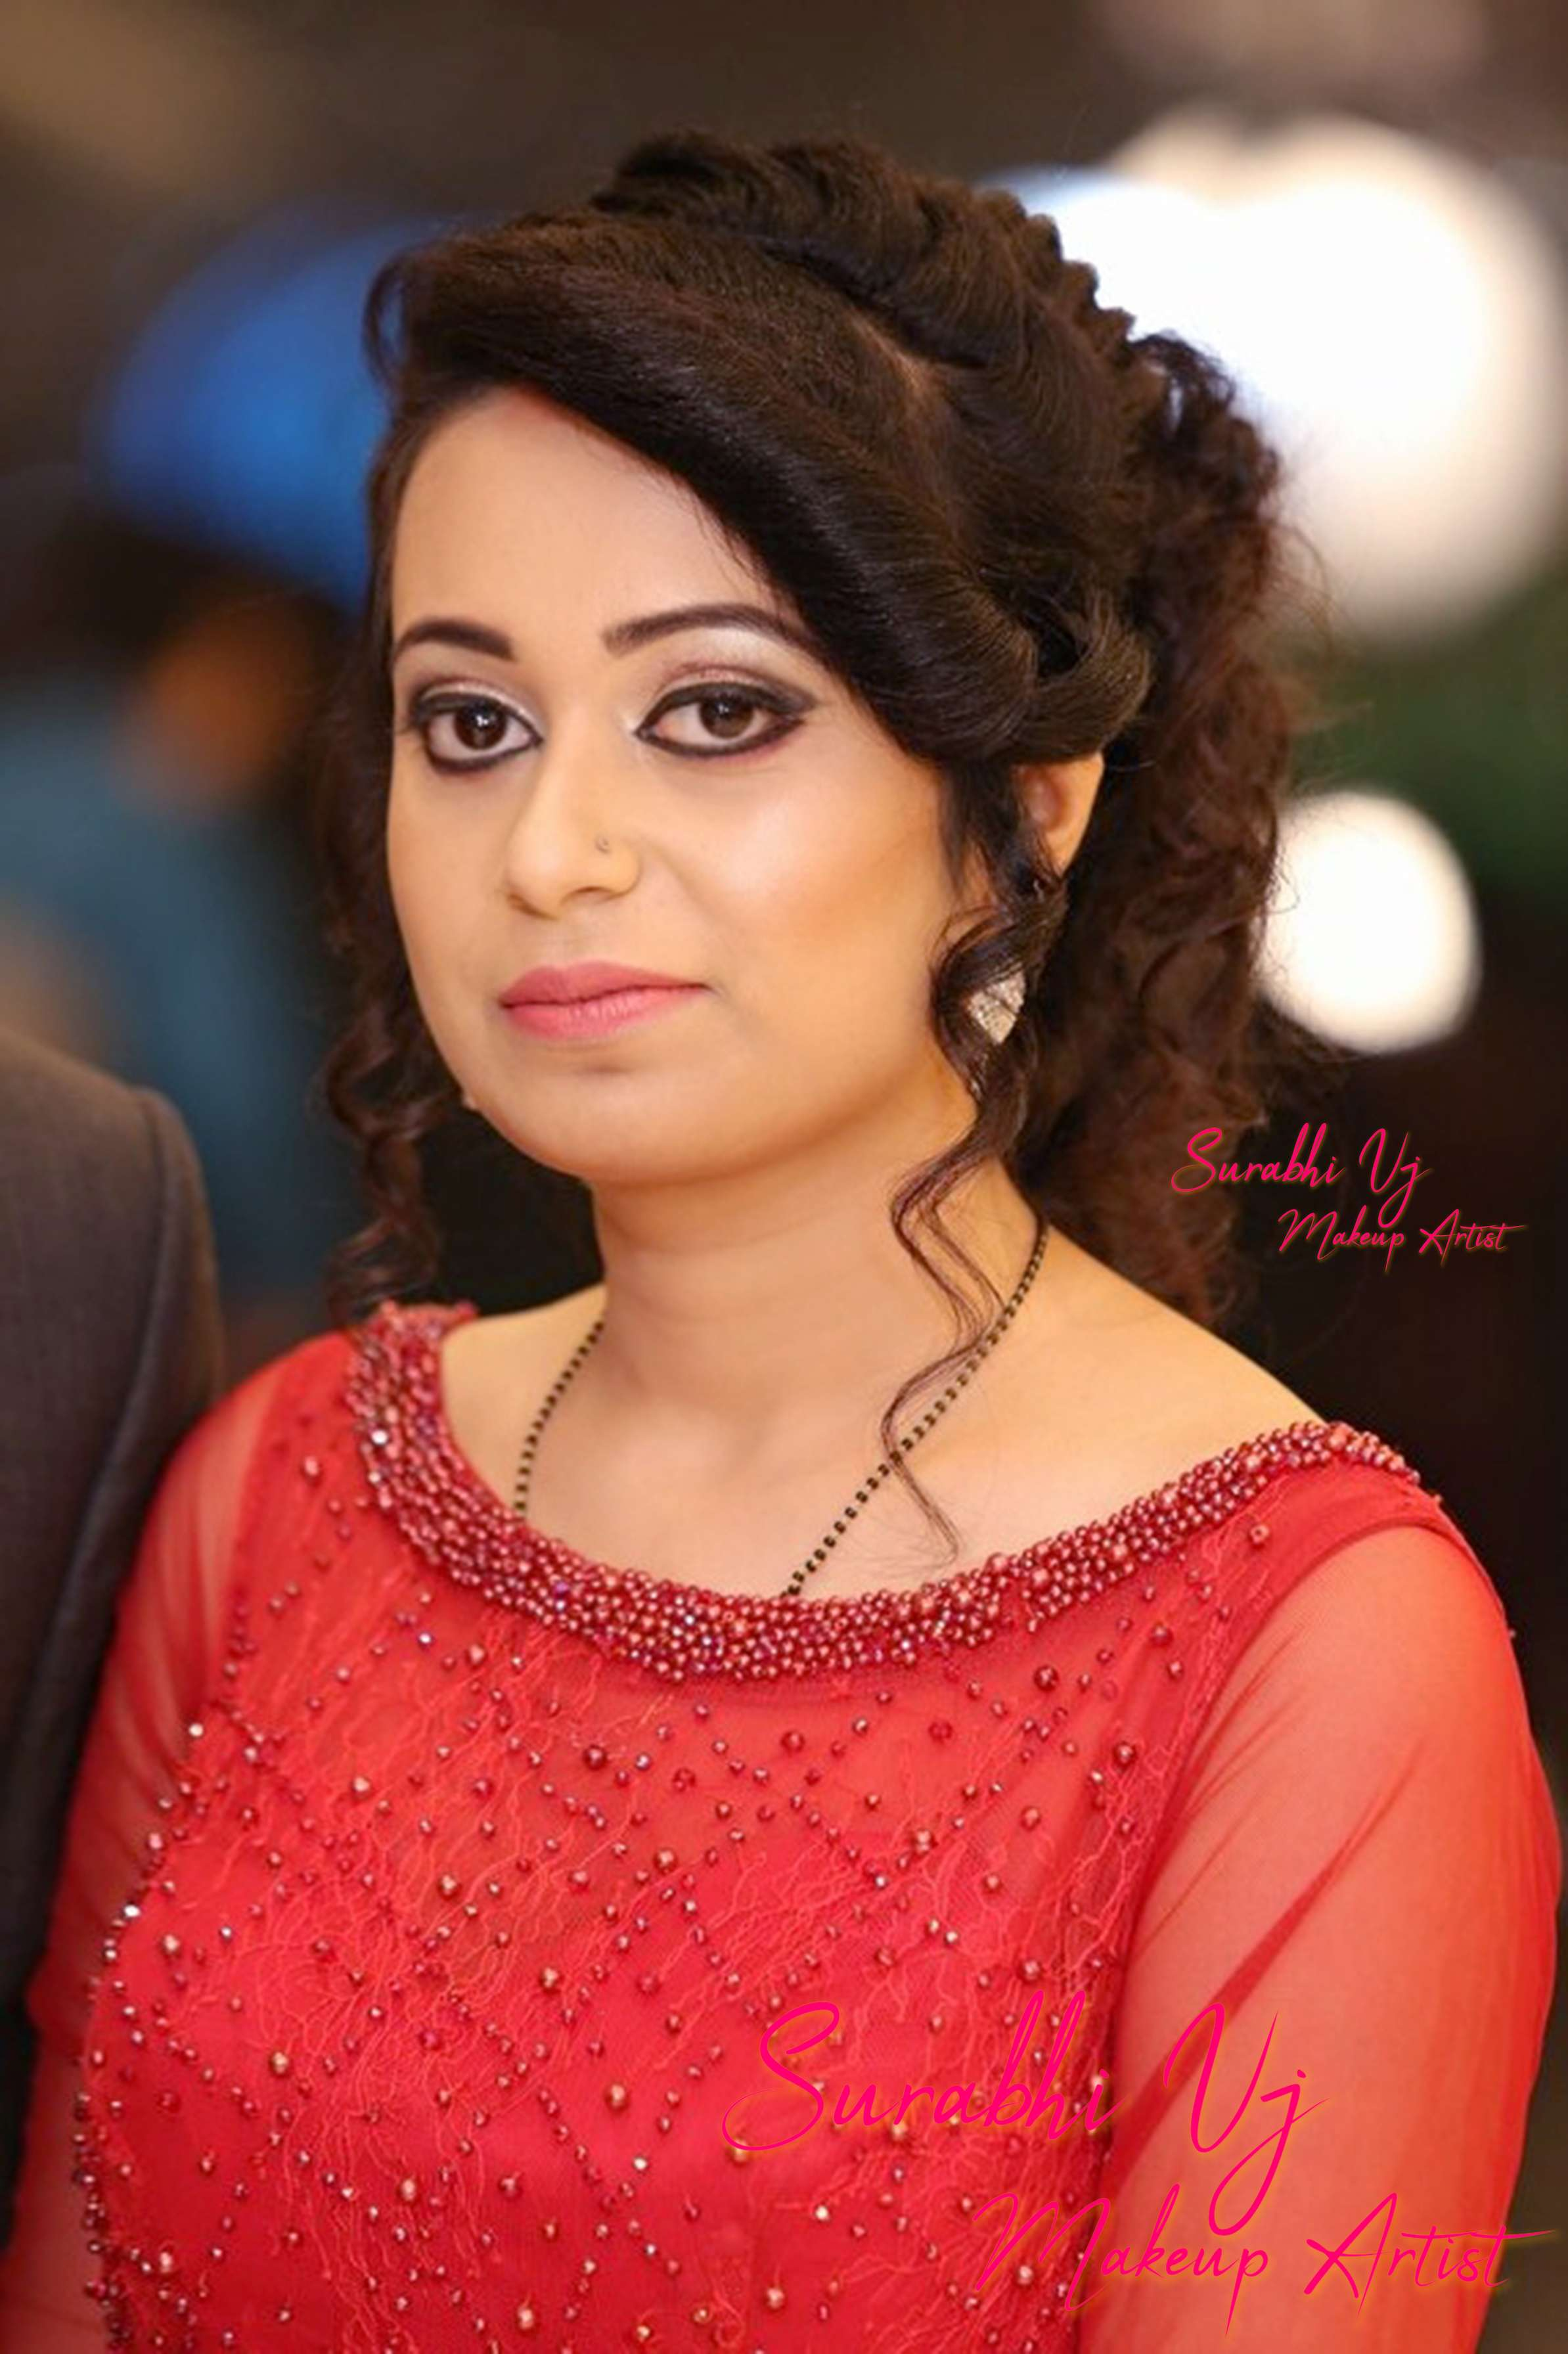 Portfolio - Surabhi Vj - Makeup Artist